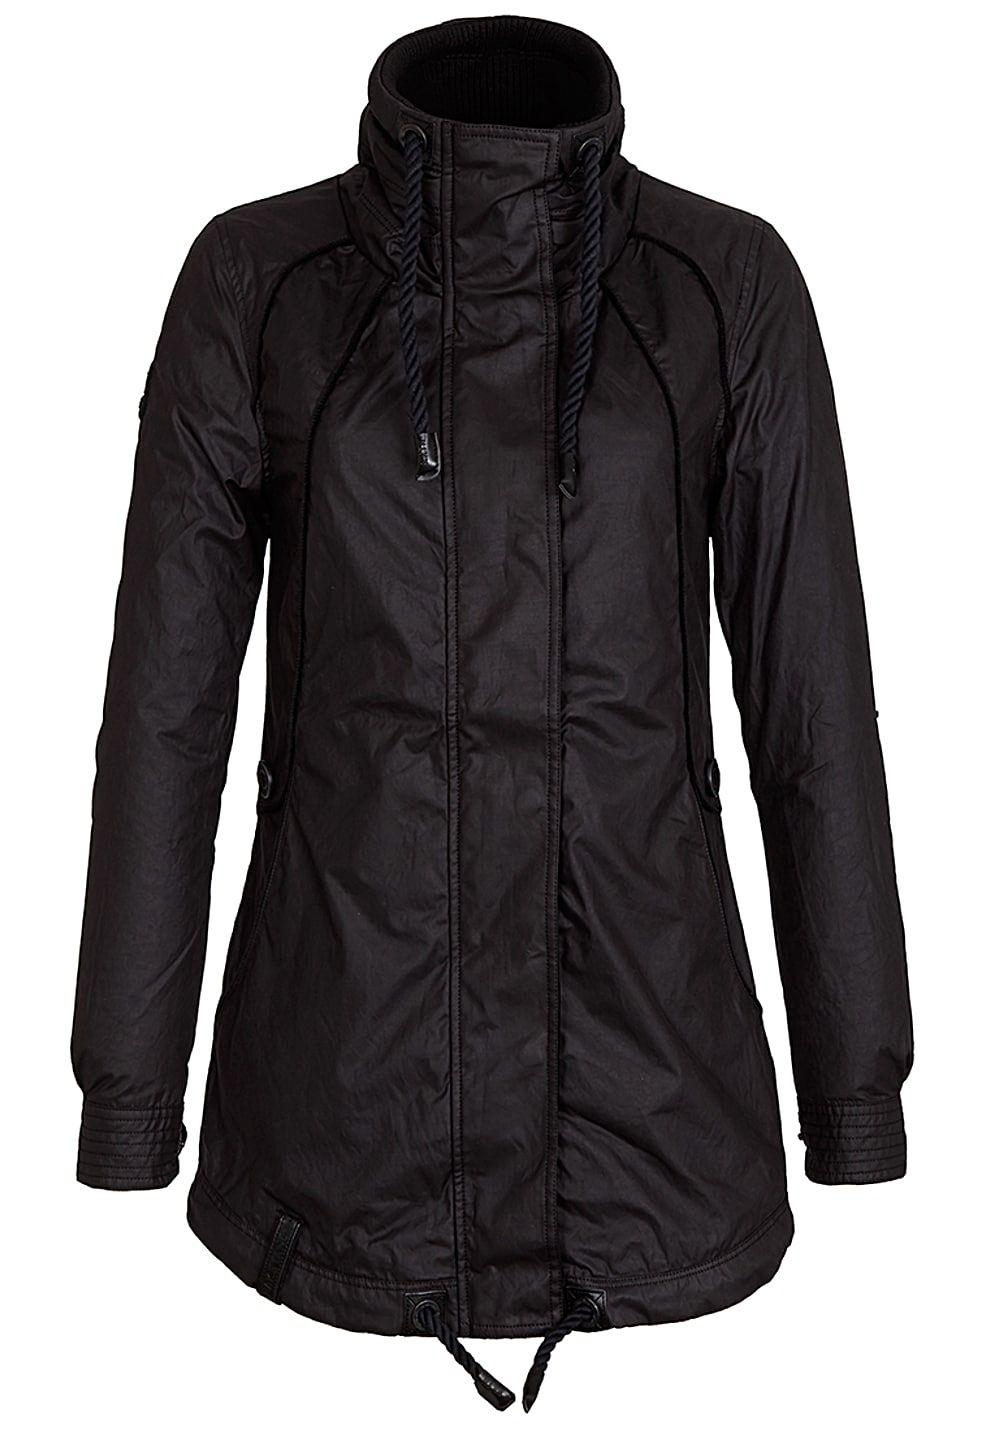 Naketano Black Tanaka Jacke für Damen Schwarz Jetzt